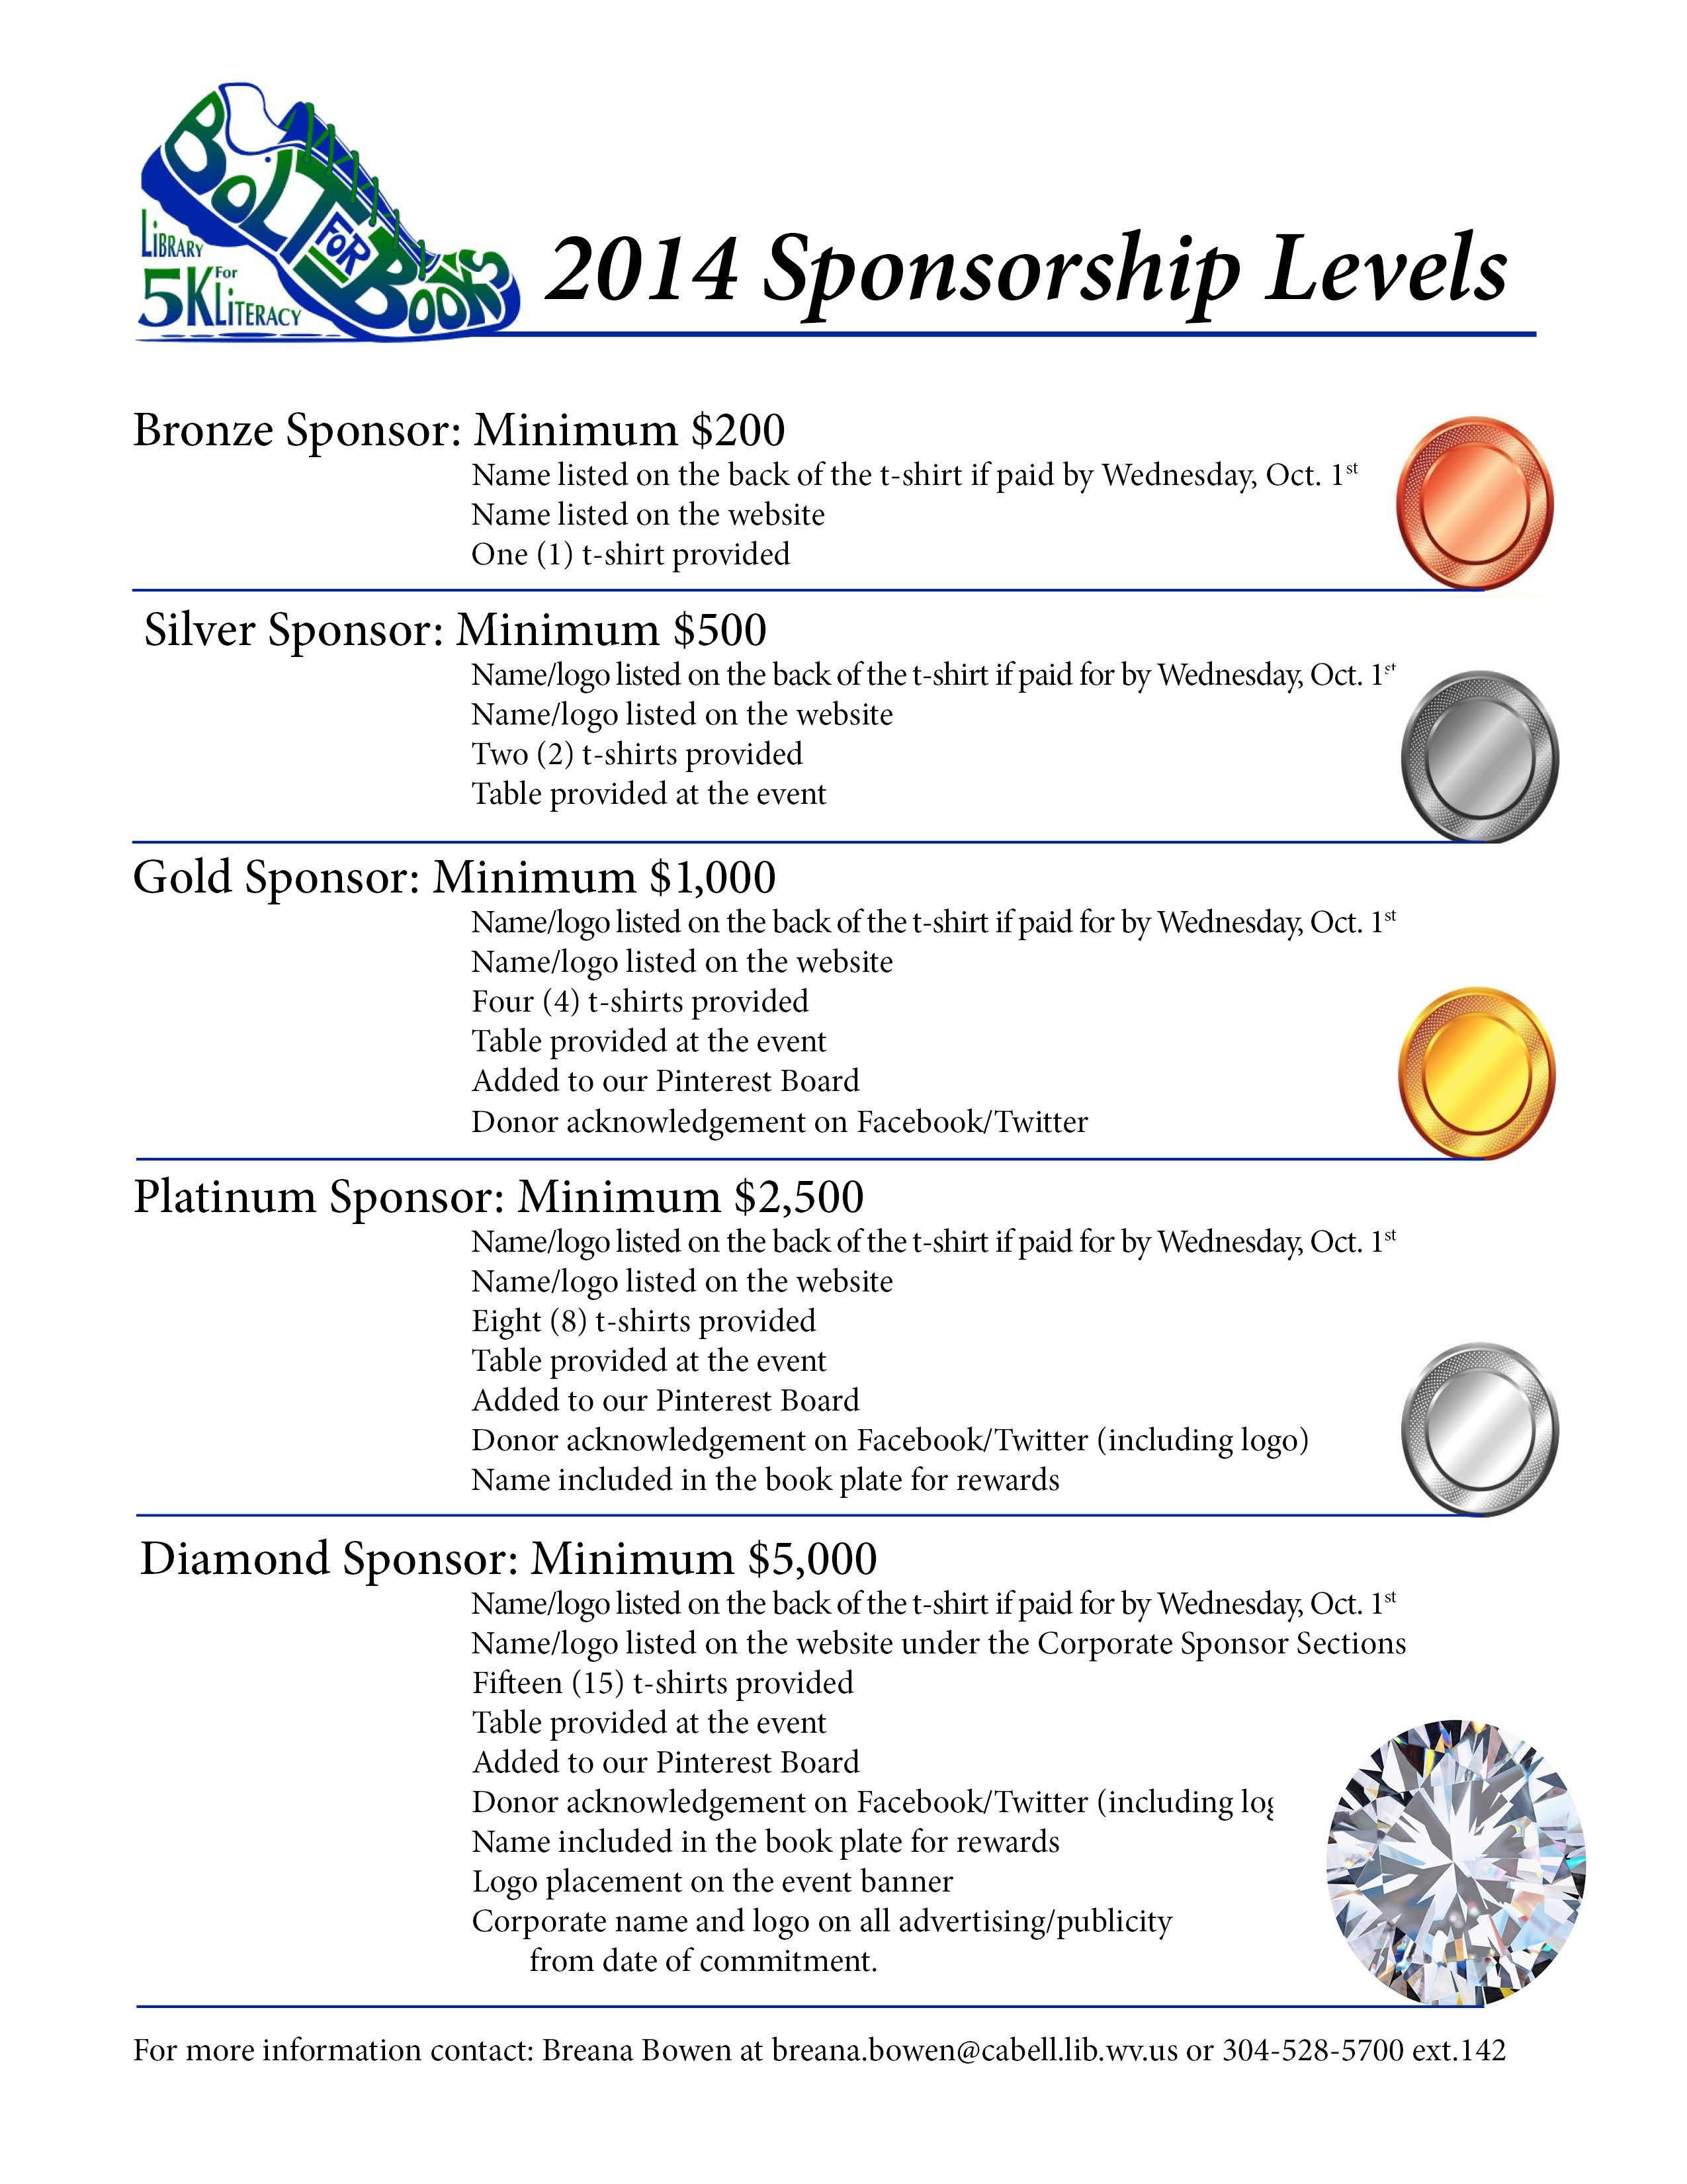 003 Top Event Sponsorship Form Template High Definition  Sponsor RequestFull